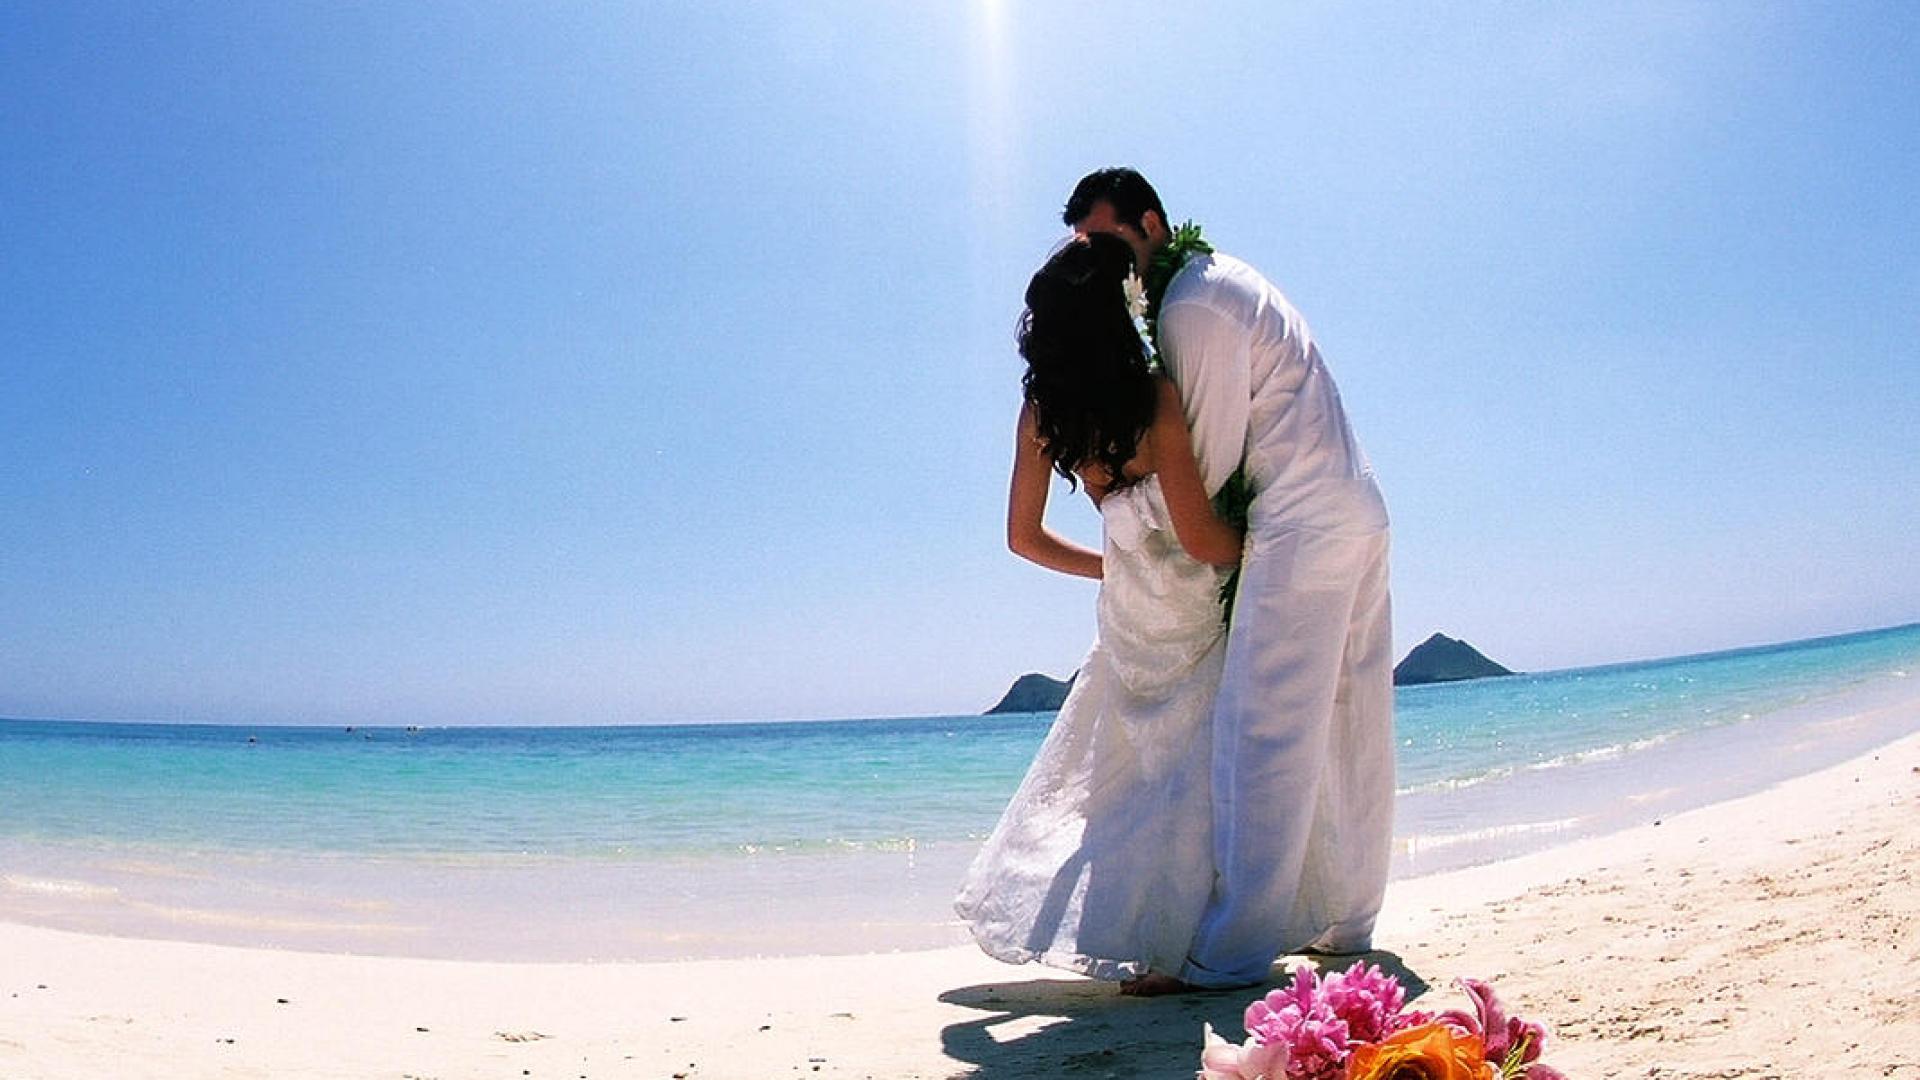 Hawaii-Beach-Wedding-Photos-HD-Wallpaper